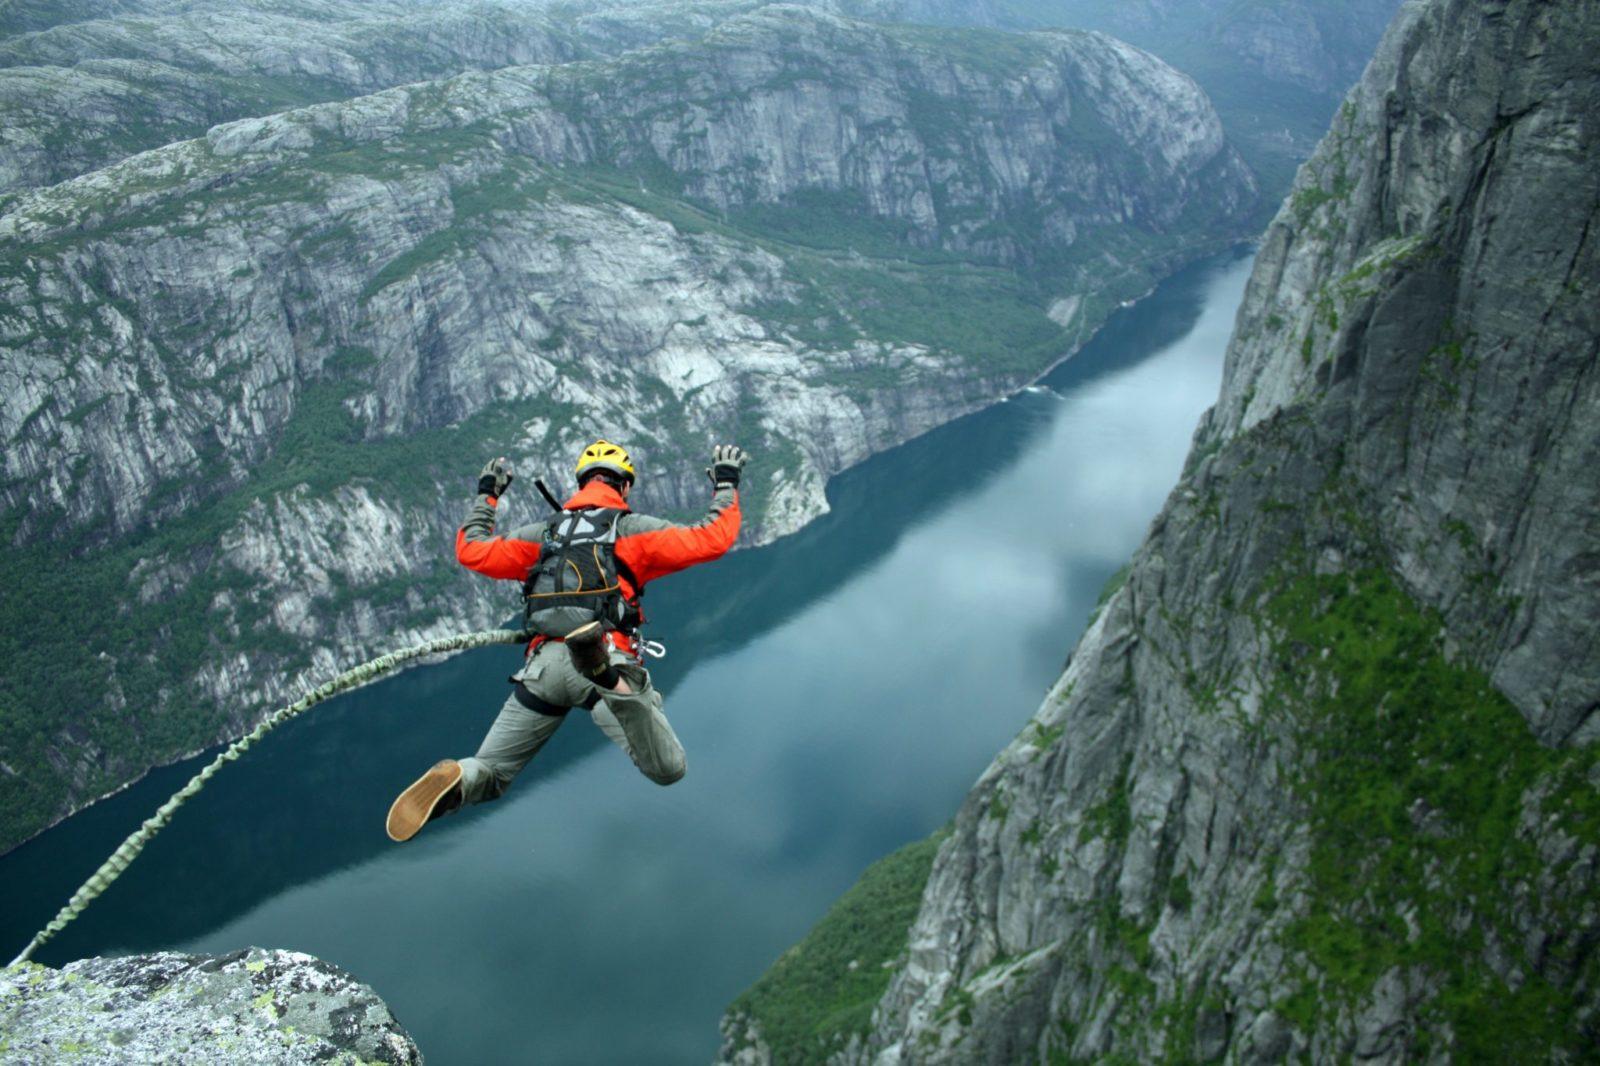 Bungee Jumping - Adrenalin in der Luft | Rahmenprogramme